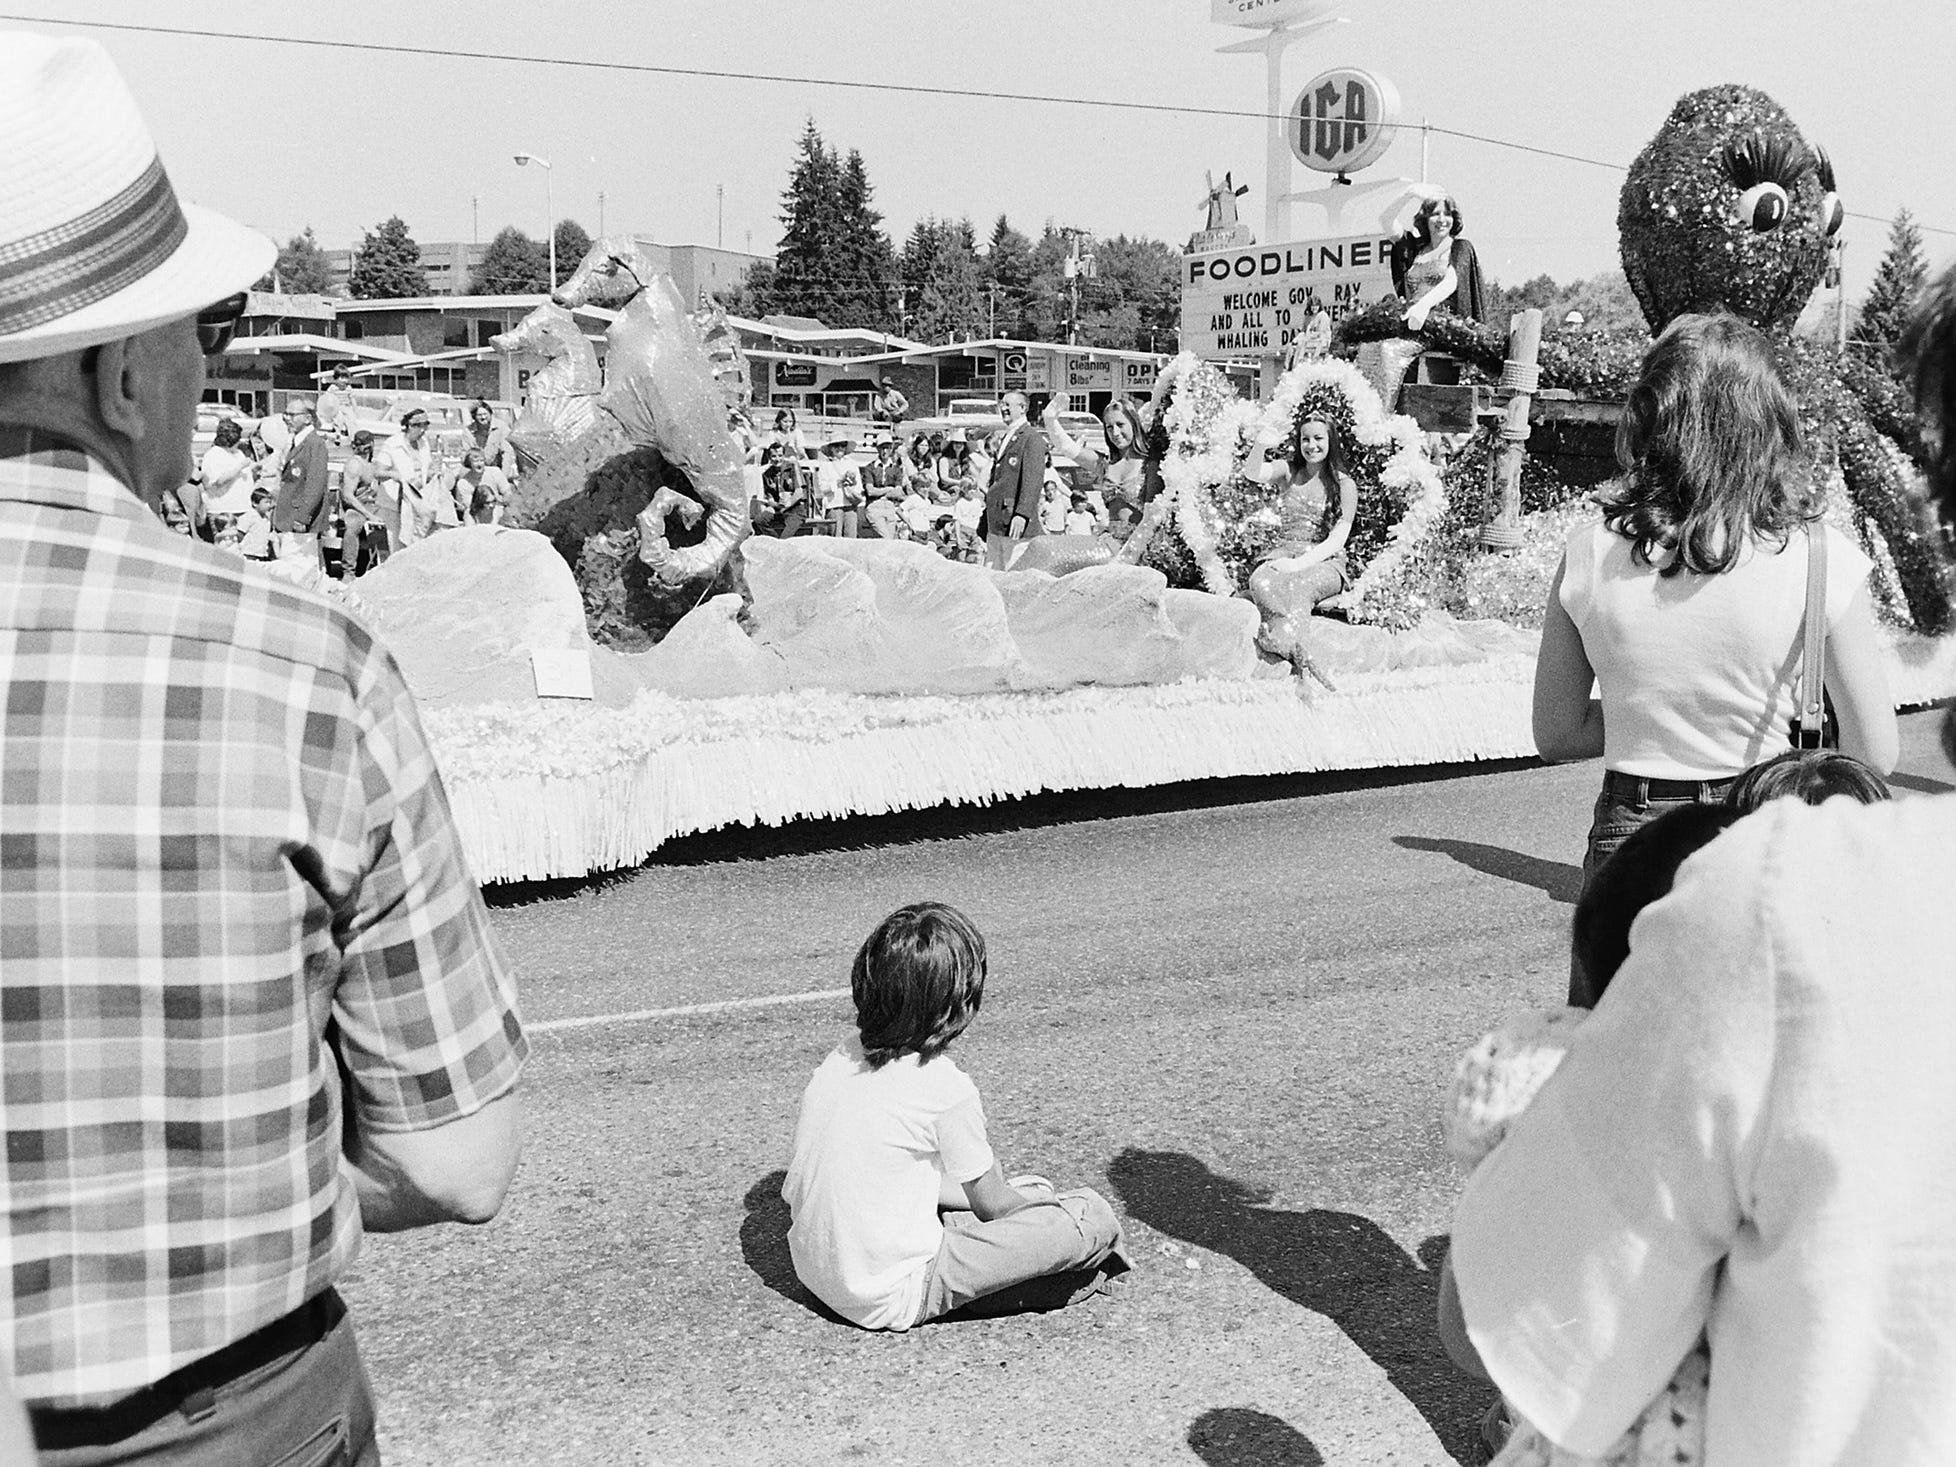 07/25/77Whaling Days Parade